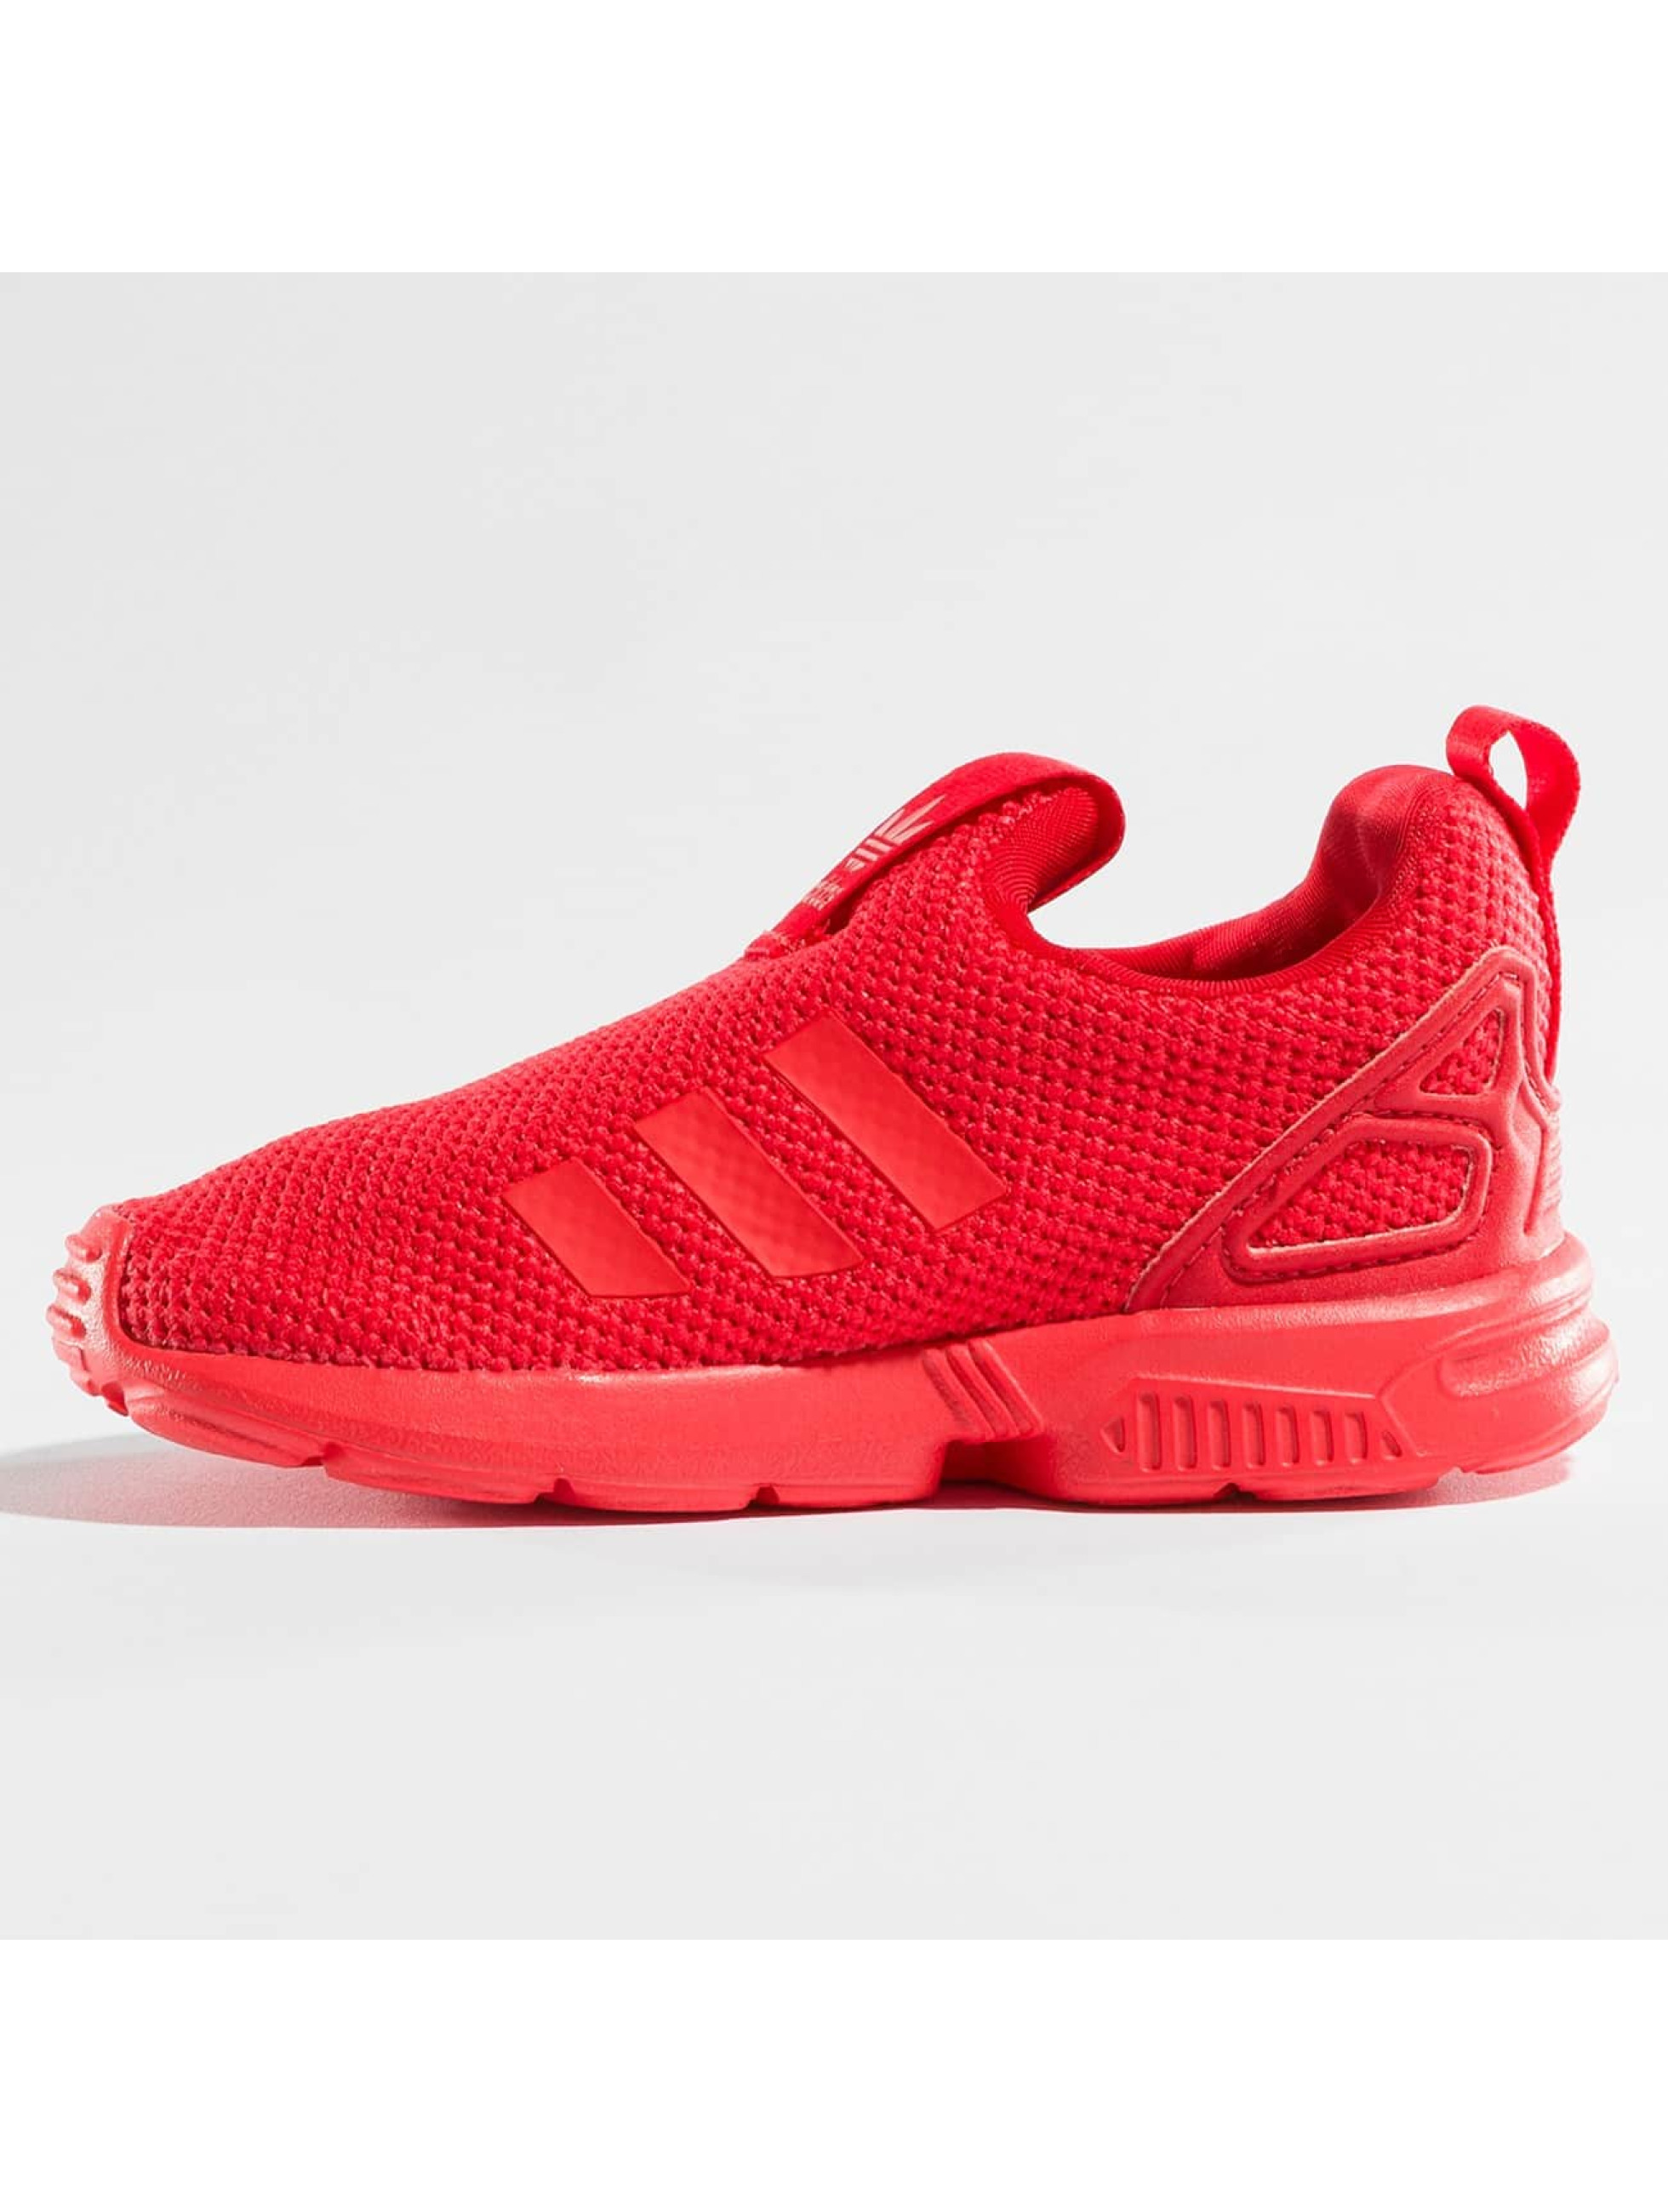 adidas originals Sneakers ZX Flux 360 SC I red